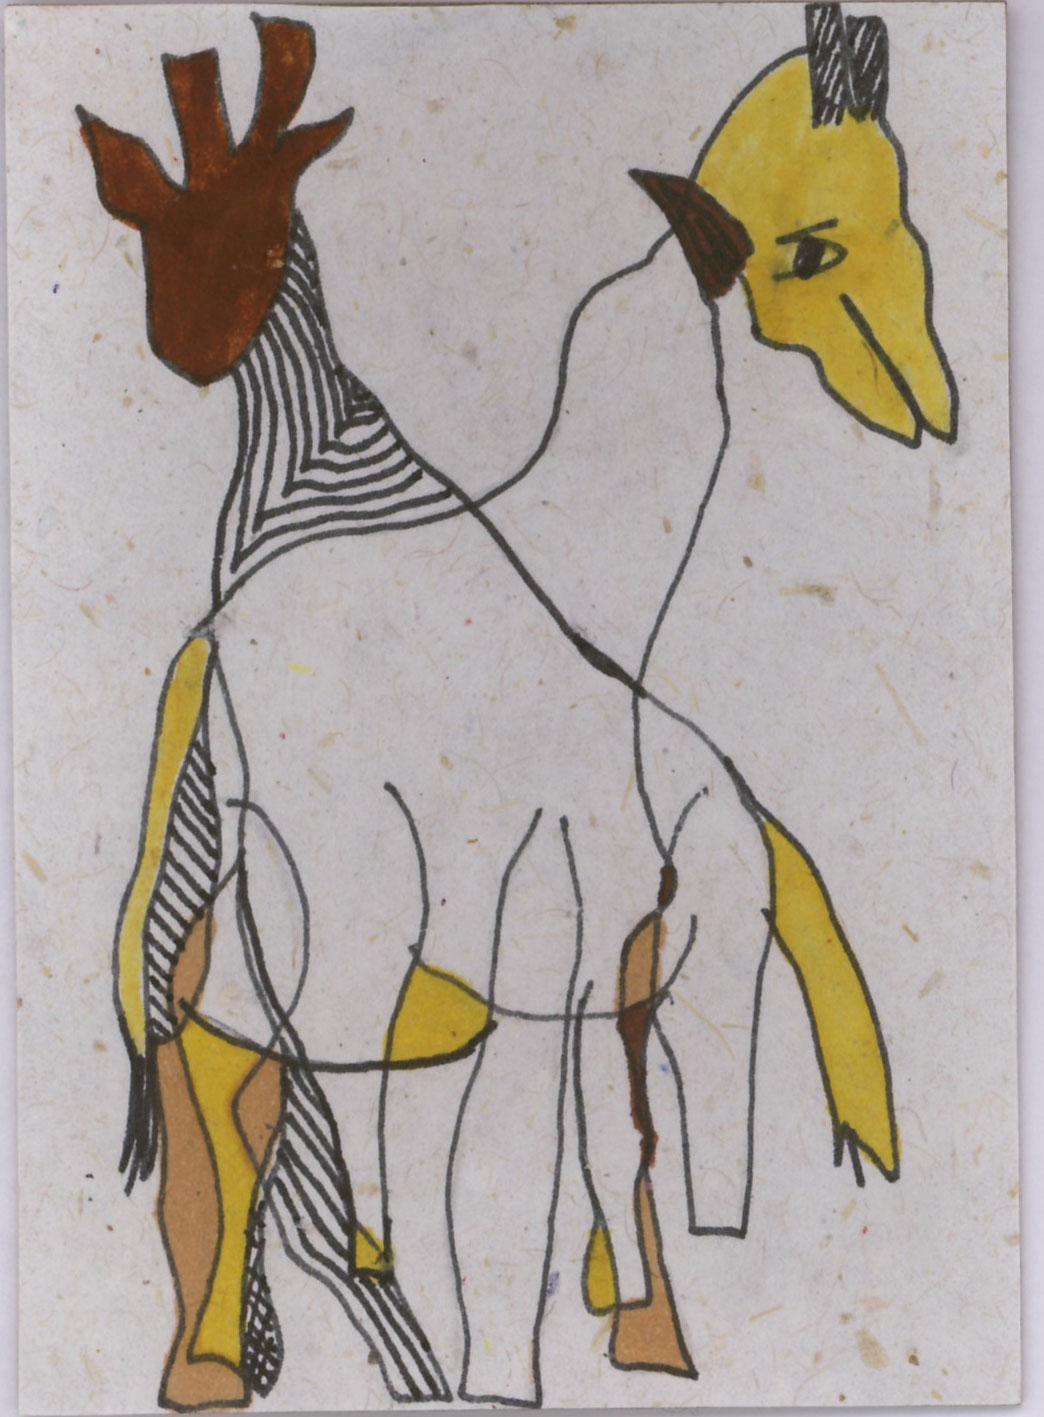 1044x1417 Accidental Artist Creative Lab Exercise 2 Blind Contour Giraffes